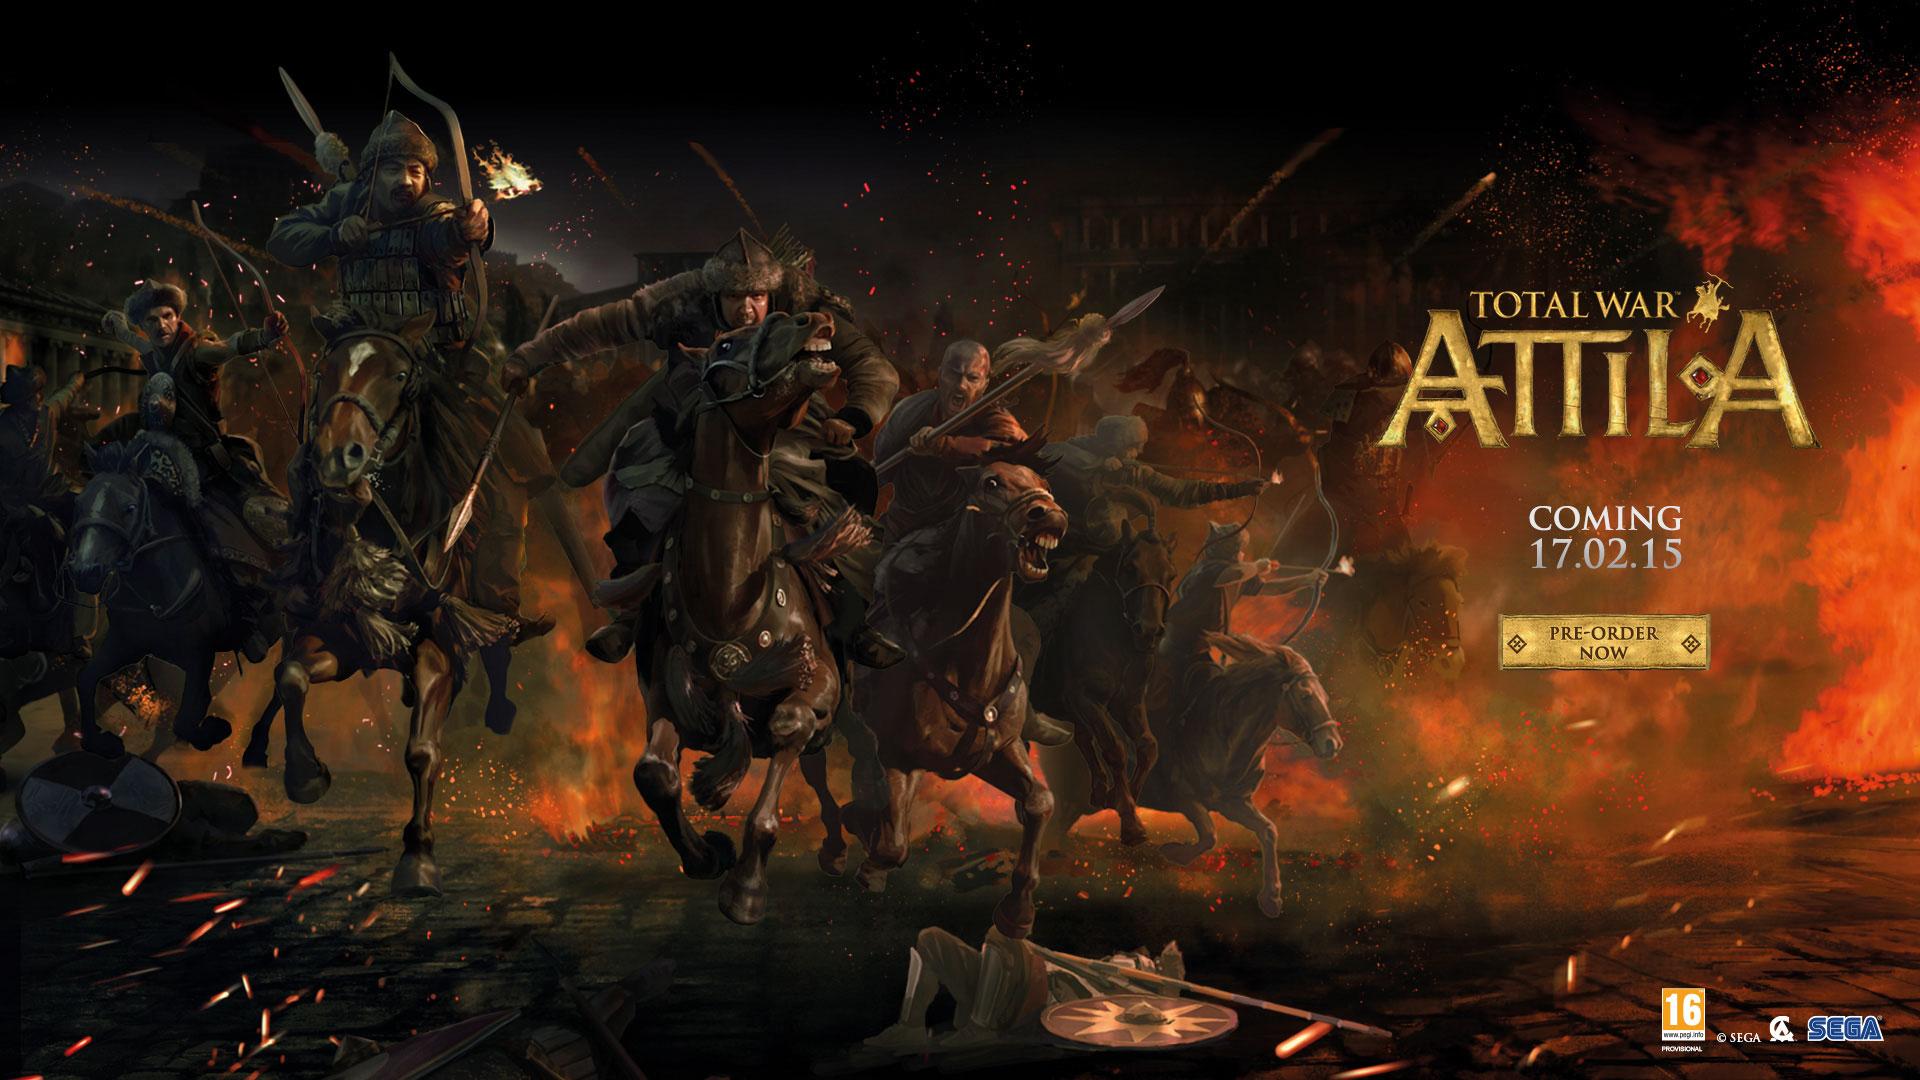 Attila Flash Banners